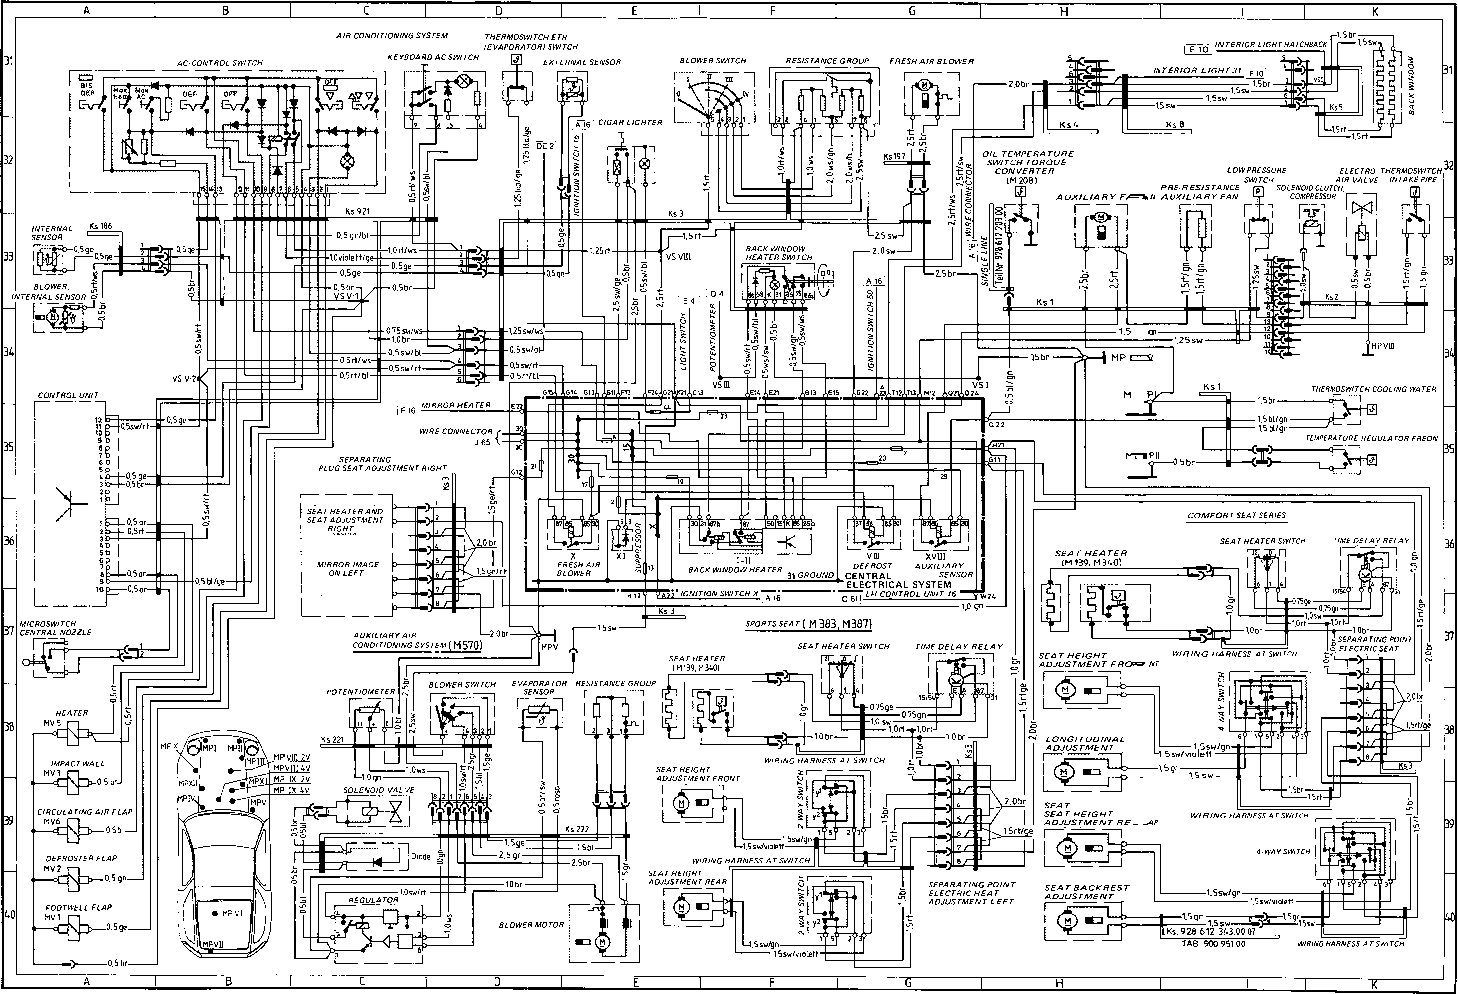 porsche 924 service manual pdf